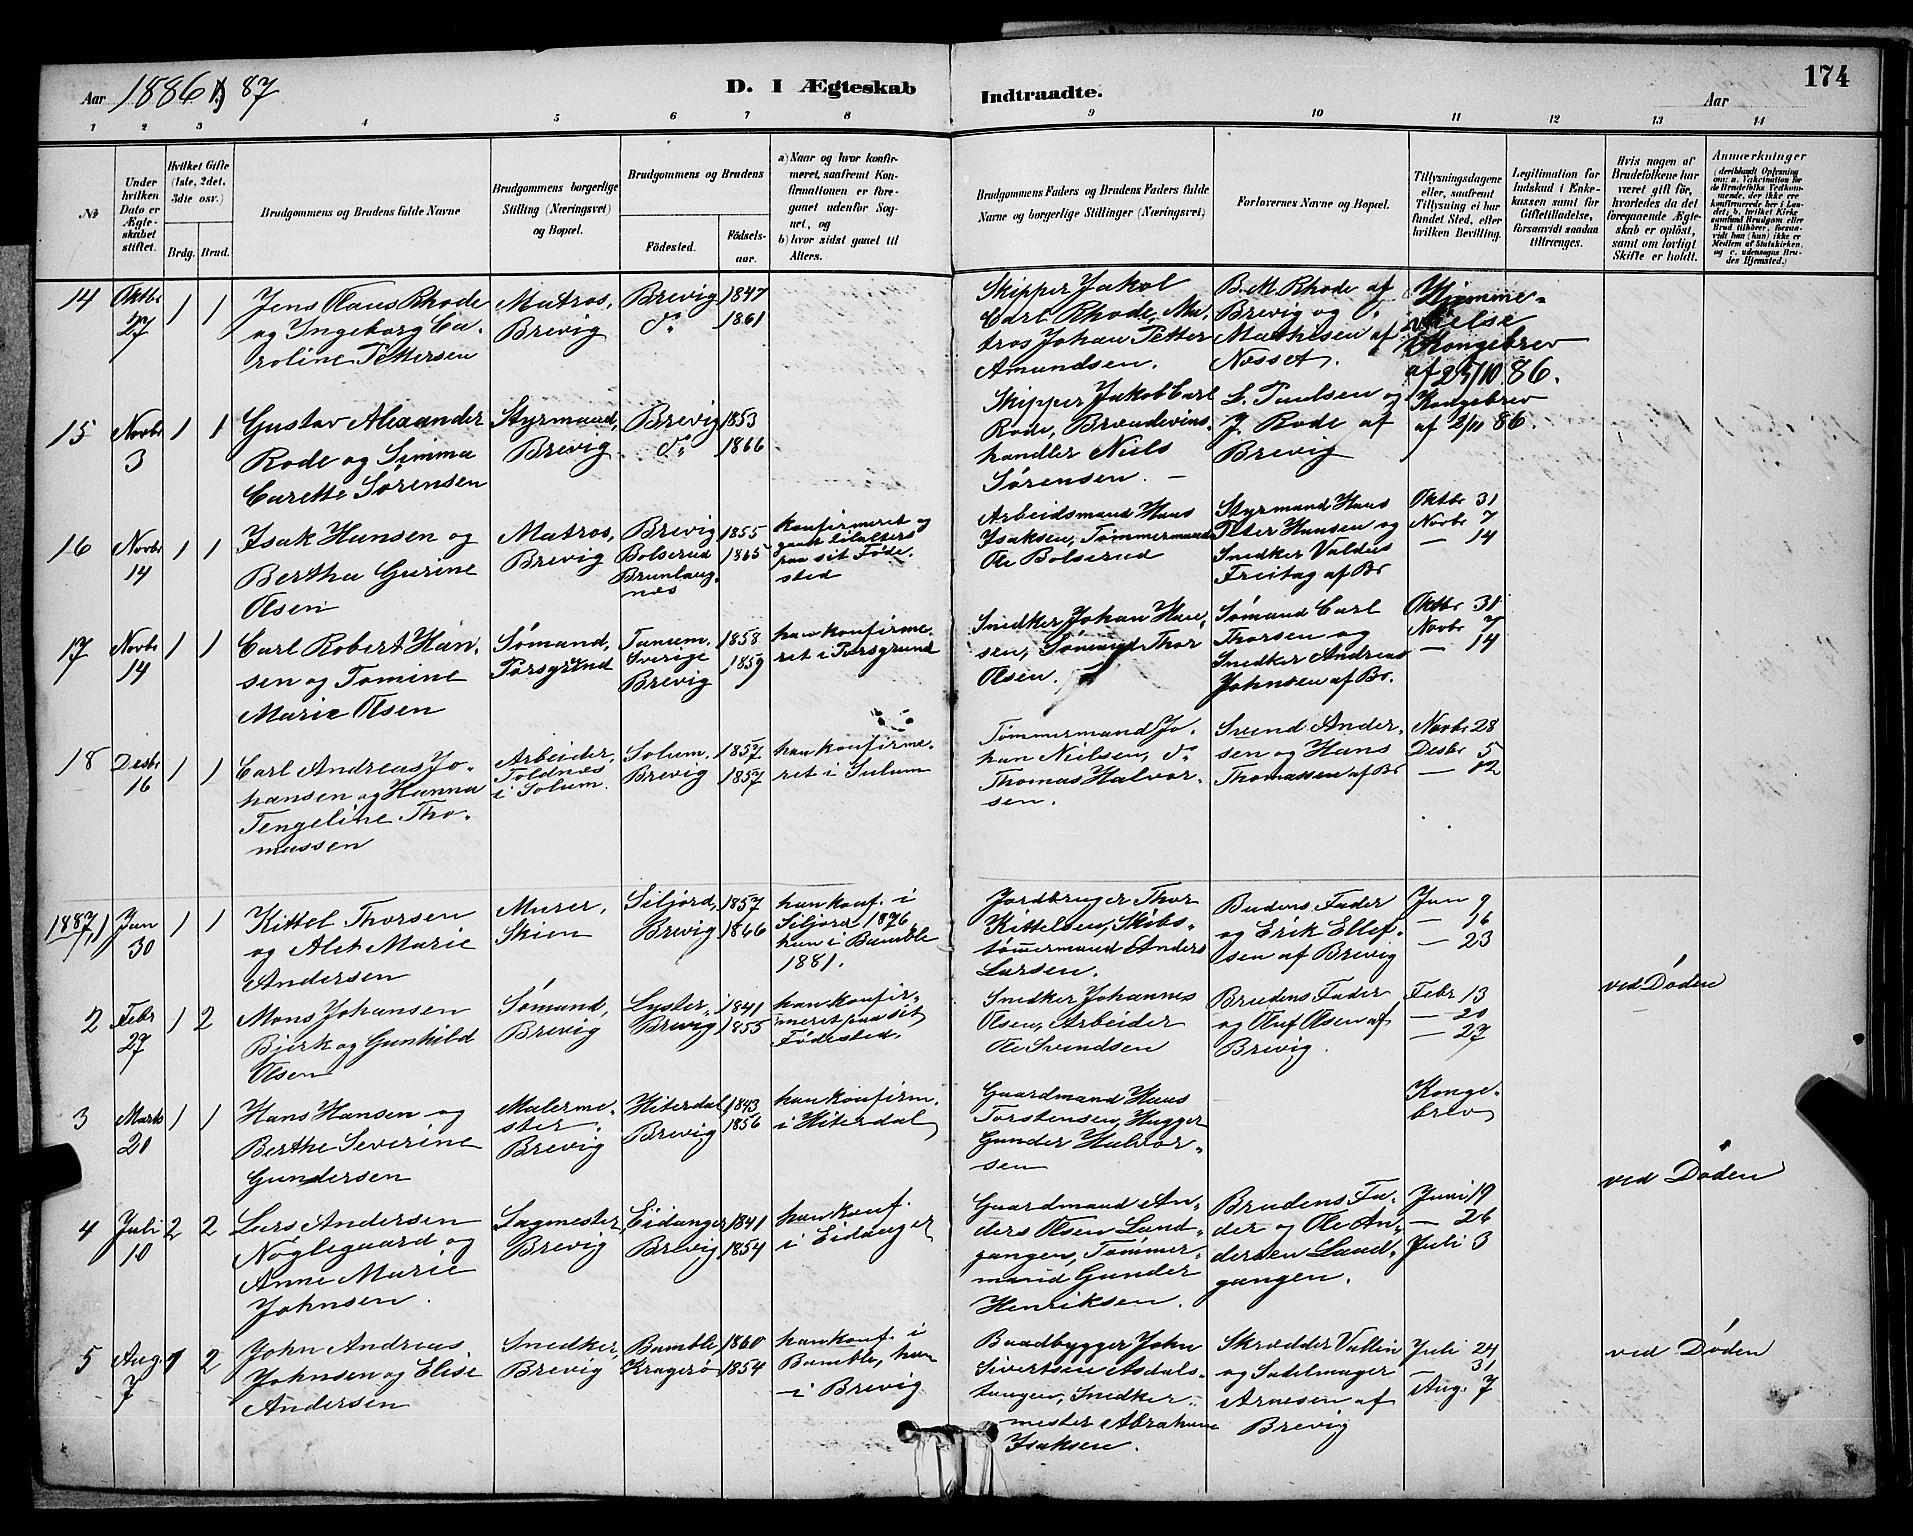 SAKO, Brevik kirkebøker, G/Ga/L0004: Klokkerbok nr. 4, 1882-1900, s. 174